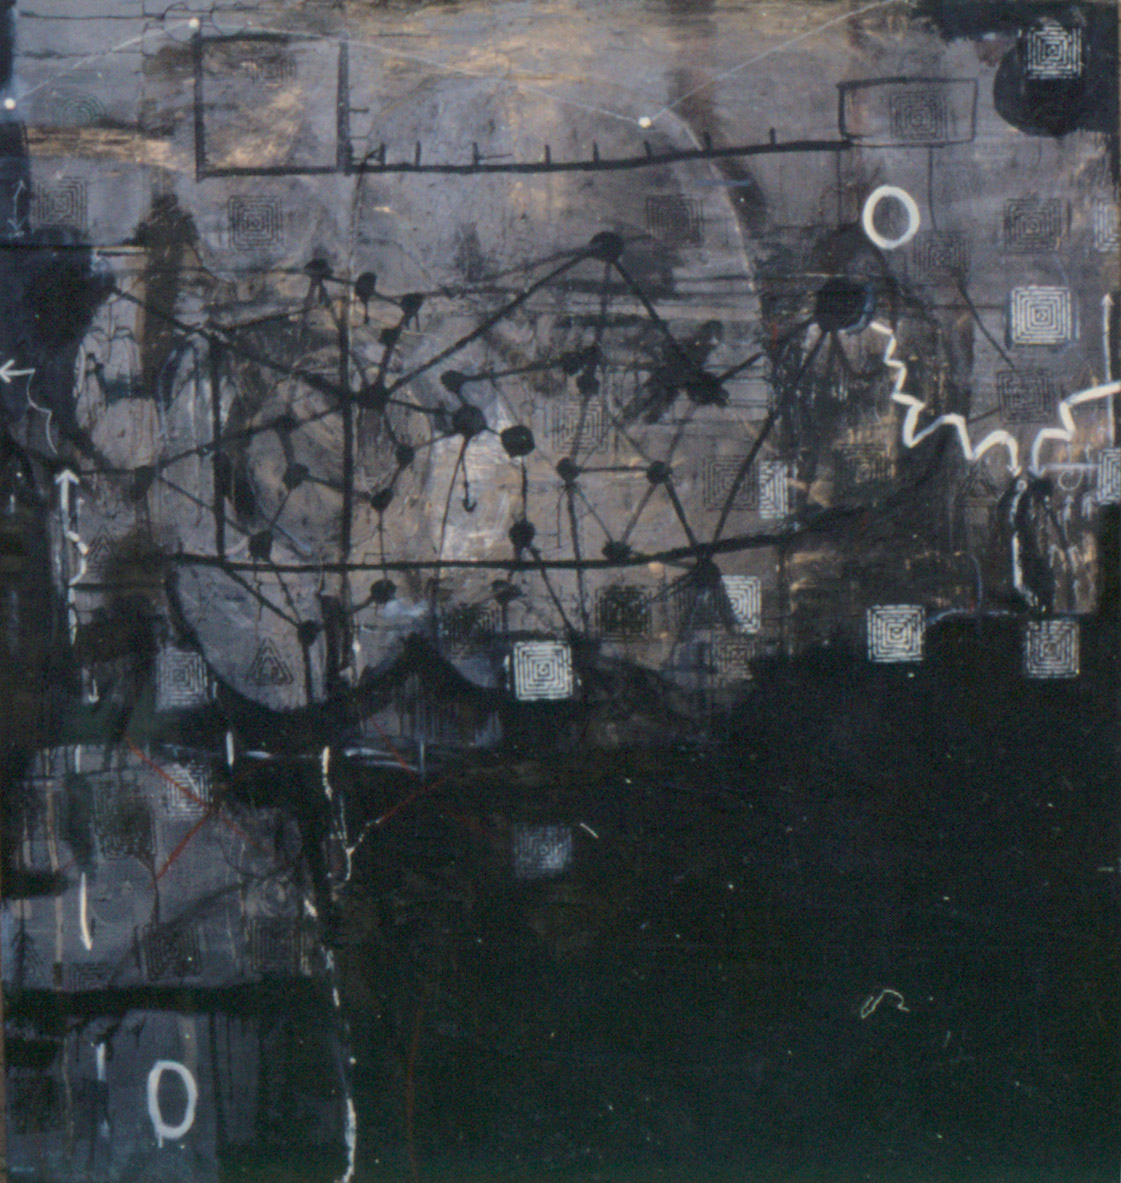 Tina Douglas | Of | Oil paint, enamel, graphite on canvas | 220 x 210cm | 1993